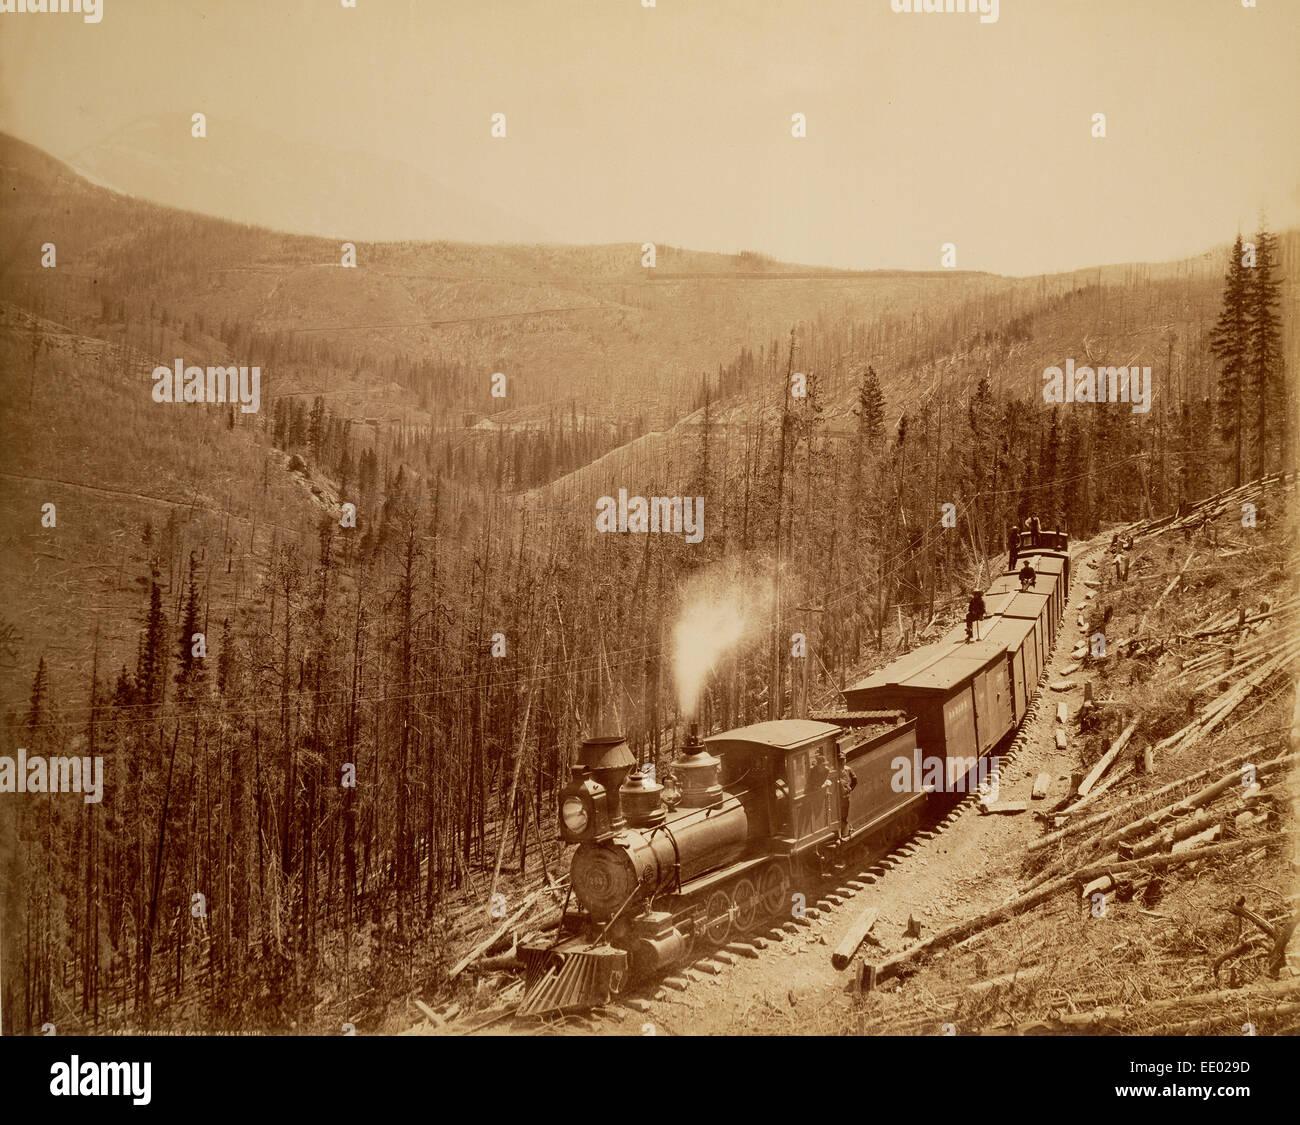 Marshall Pass, Westside; William Henry Jackson, American, 1843 - 1942; Colorado, United States, North America; 1880 - Stock Image